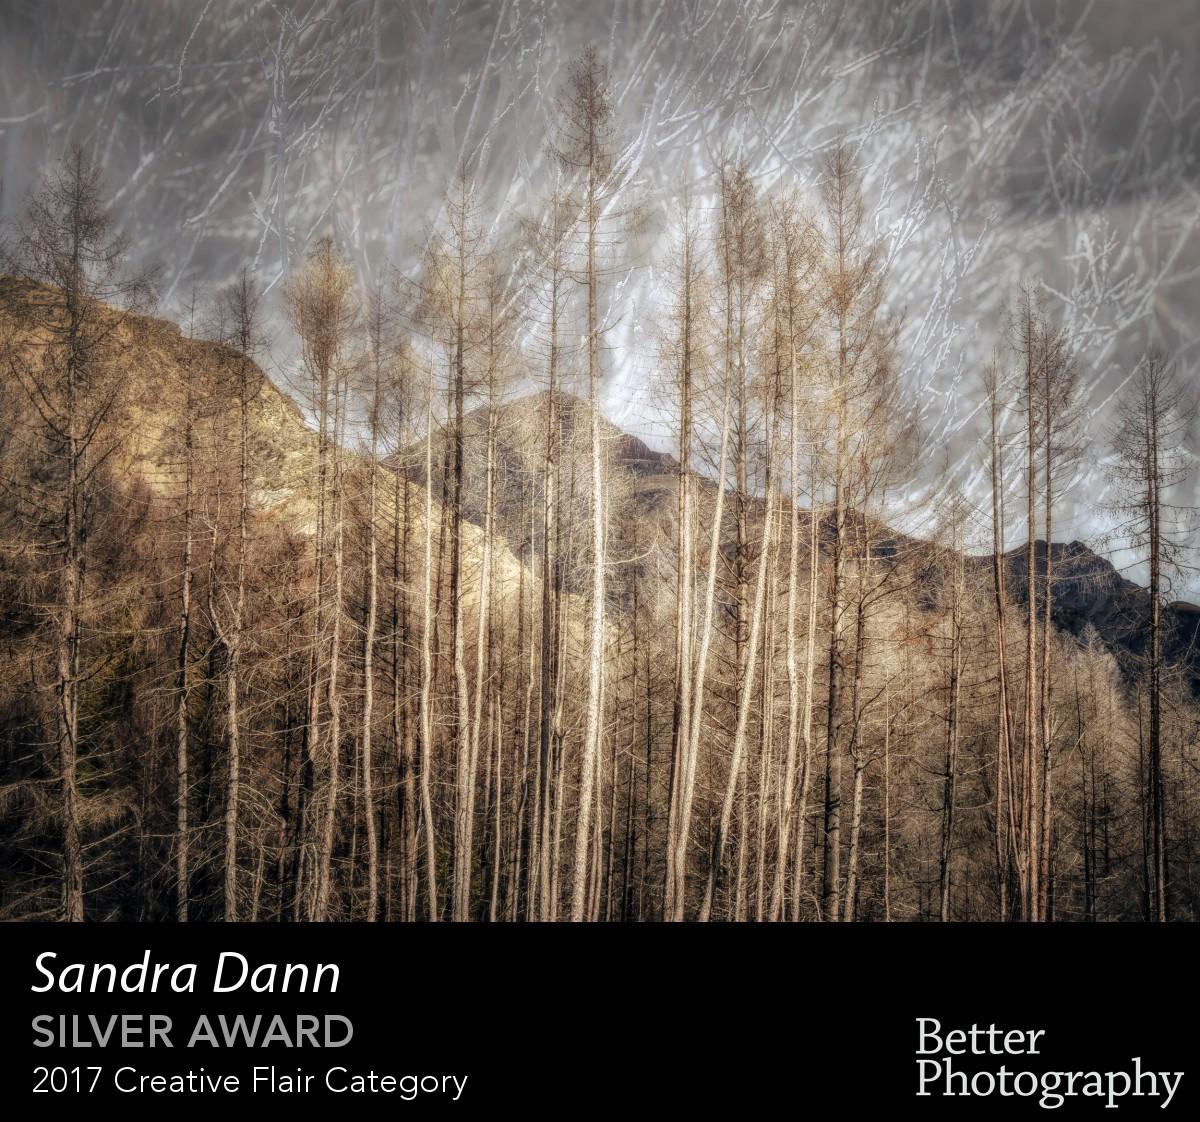 award_3087_3088_1198477405.jpg